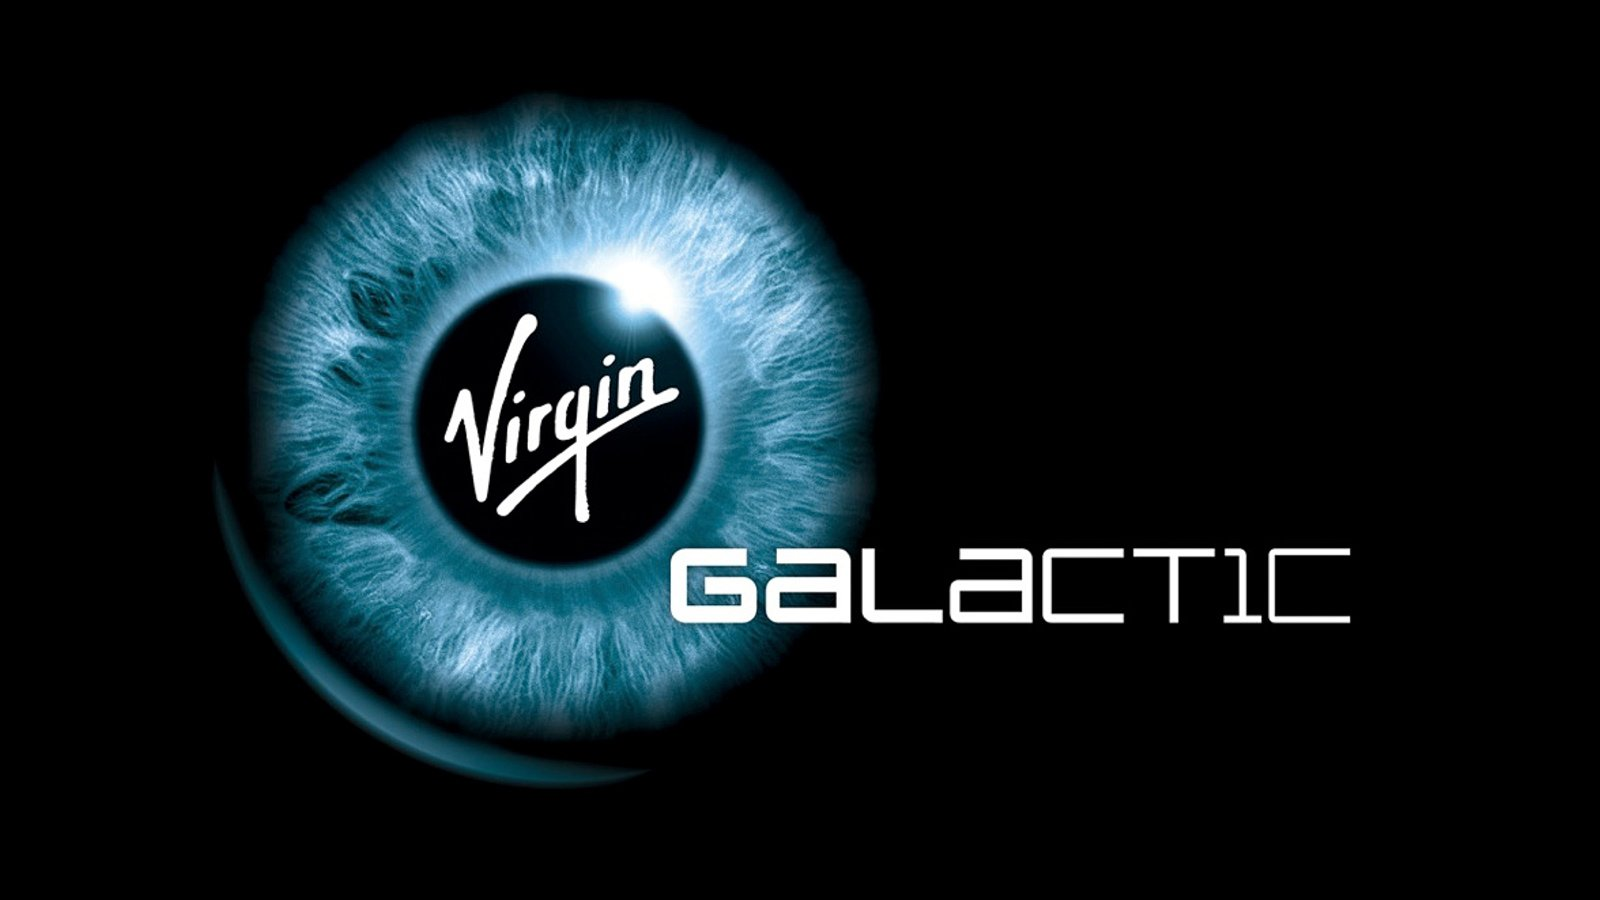 1-virgin-galactic.jpg__1600x900_q85_crop_subsampling-2_upscale.jpg.pagespeed.ce.KjlFOZeaP6.jpg